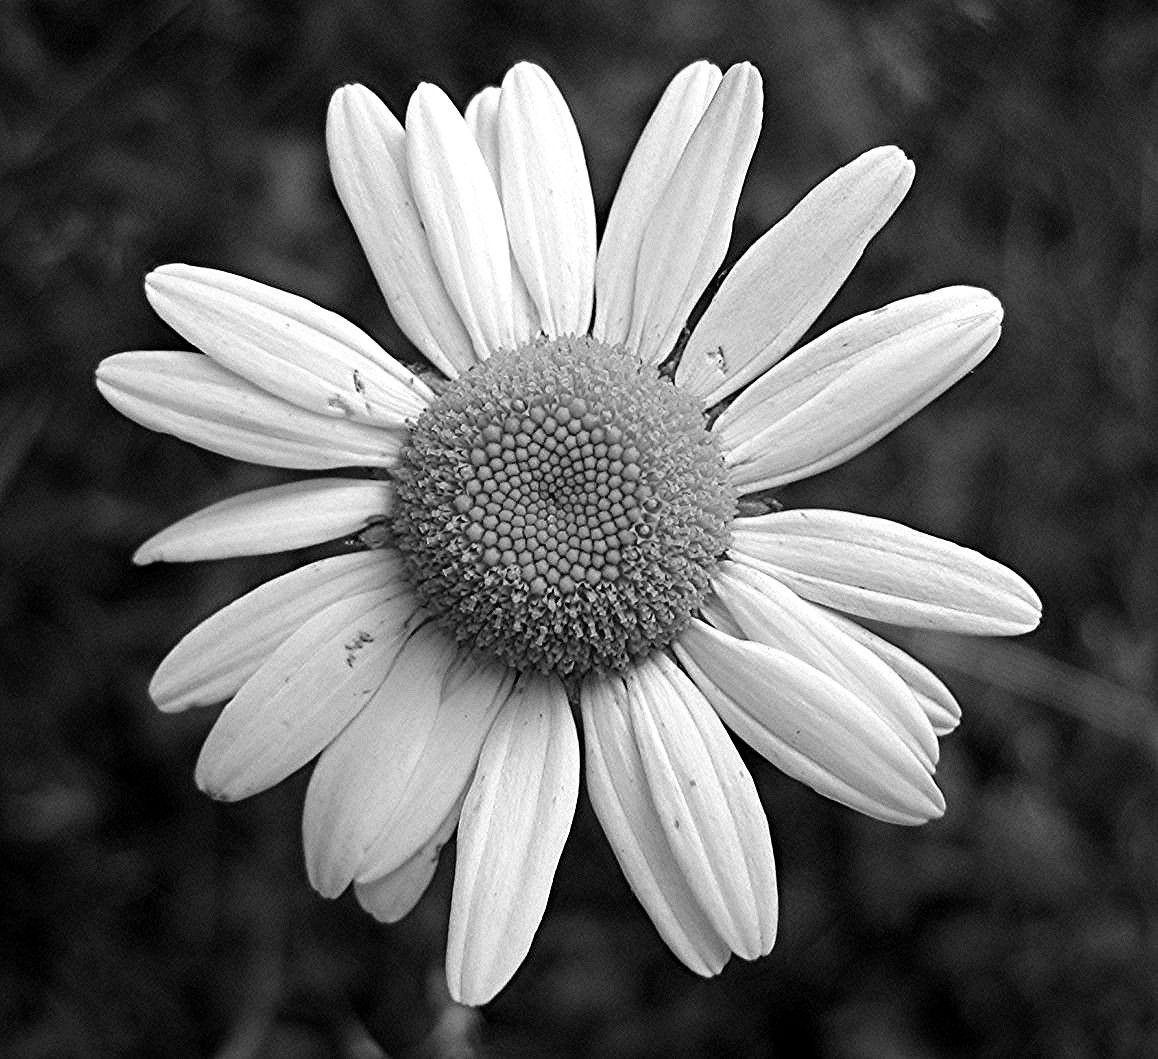 Black and White Nature Black and White Daisy Myspace